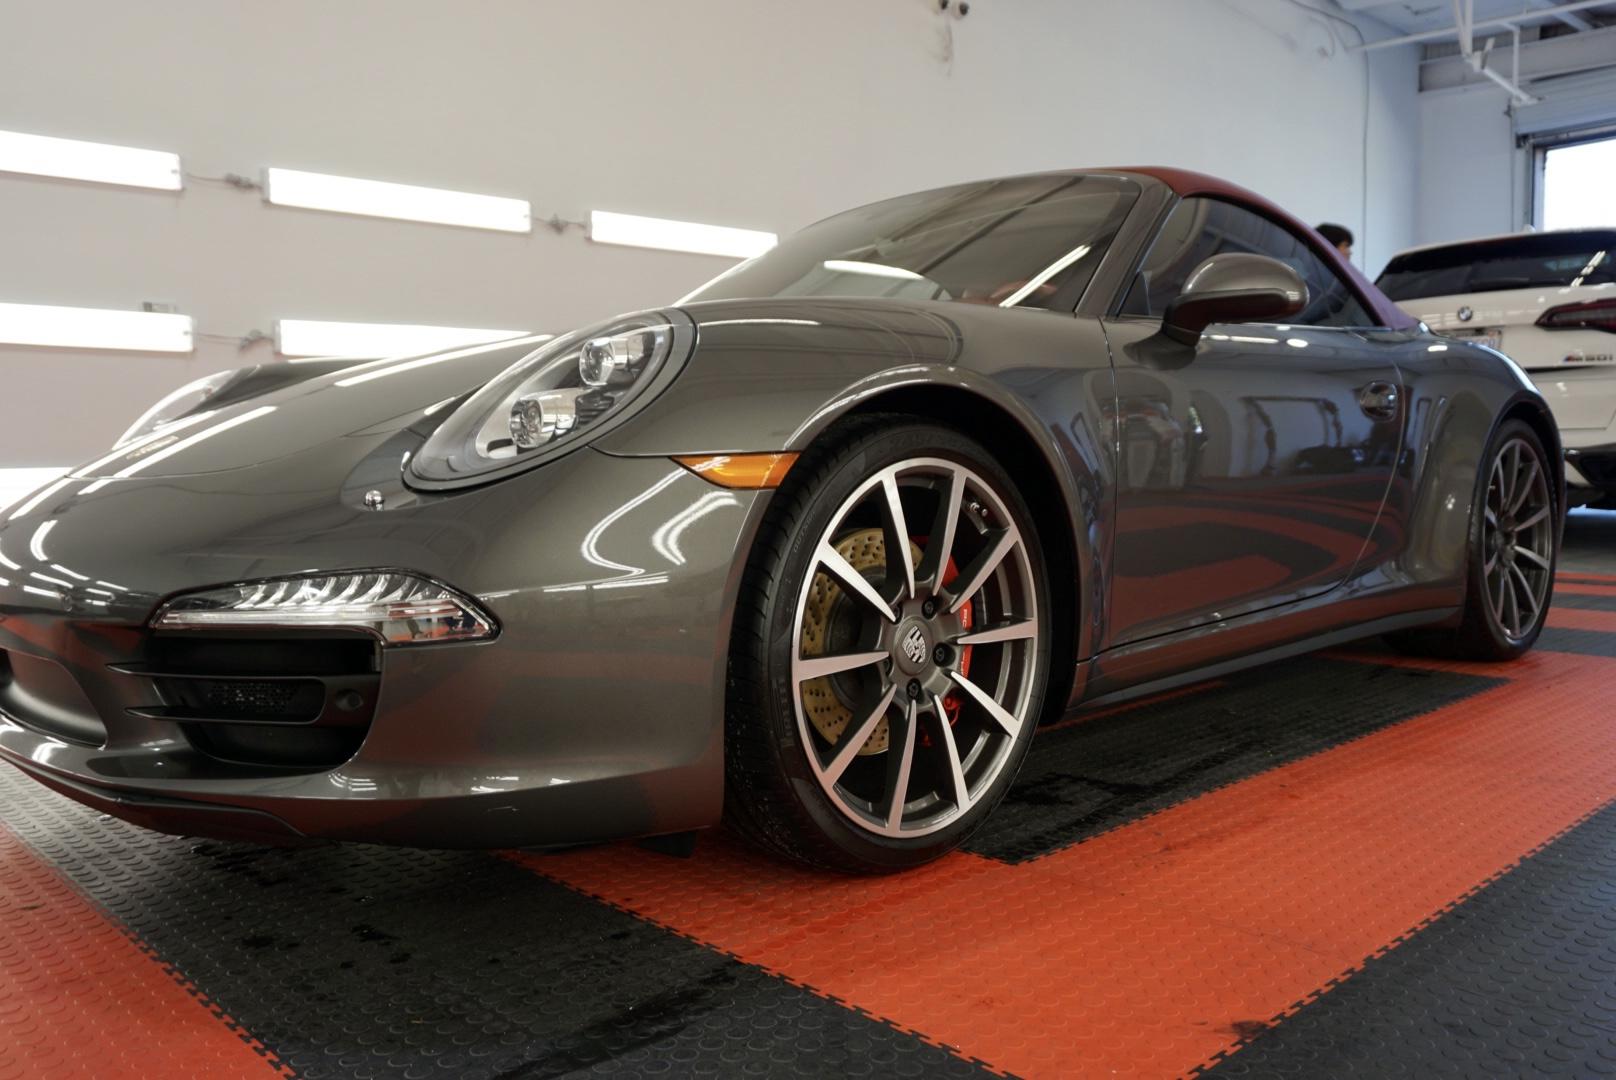 Ceramic Coating of a 2015 Porsche 911